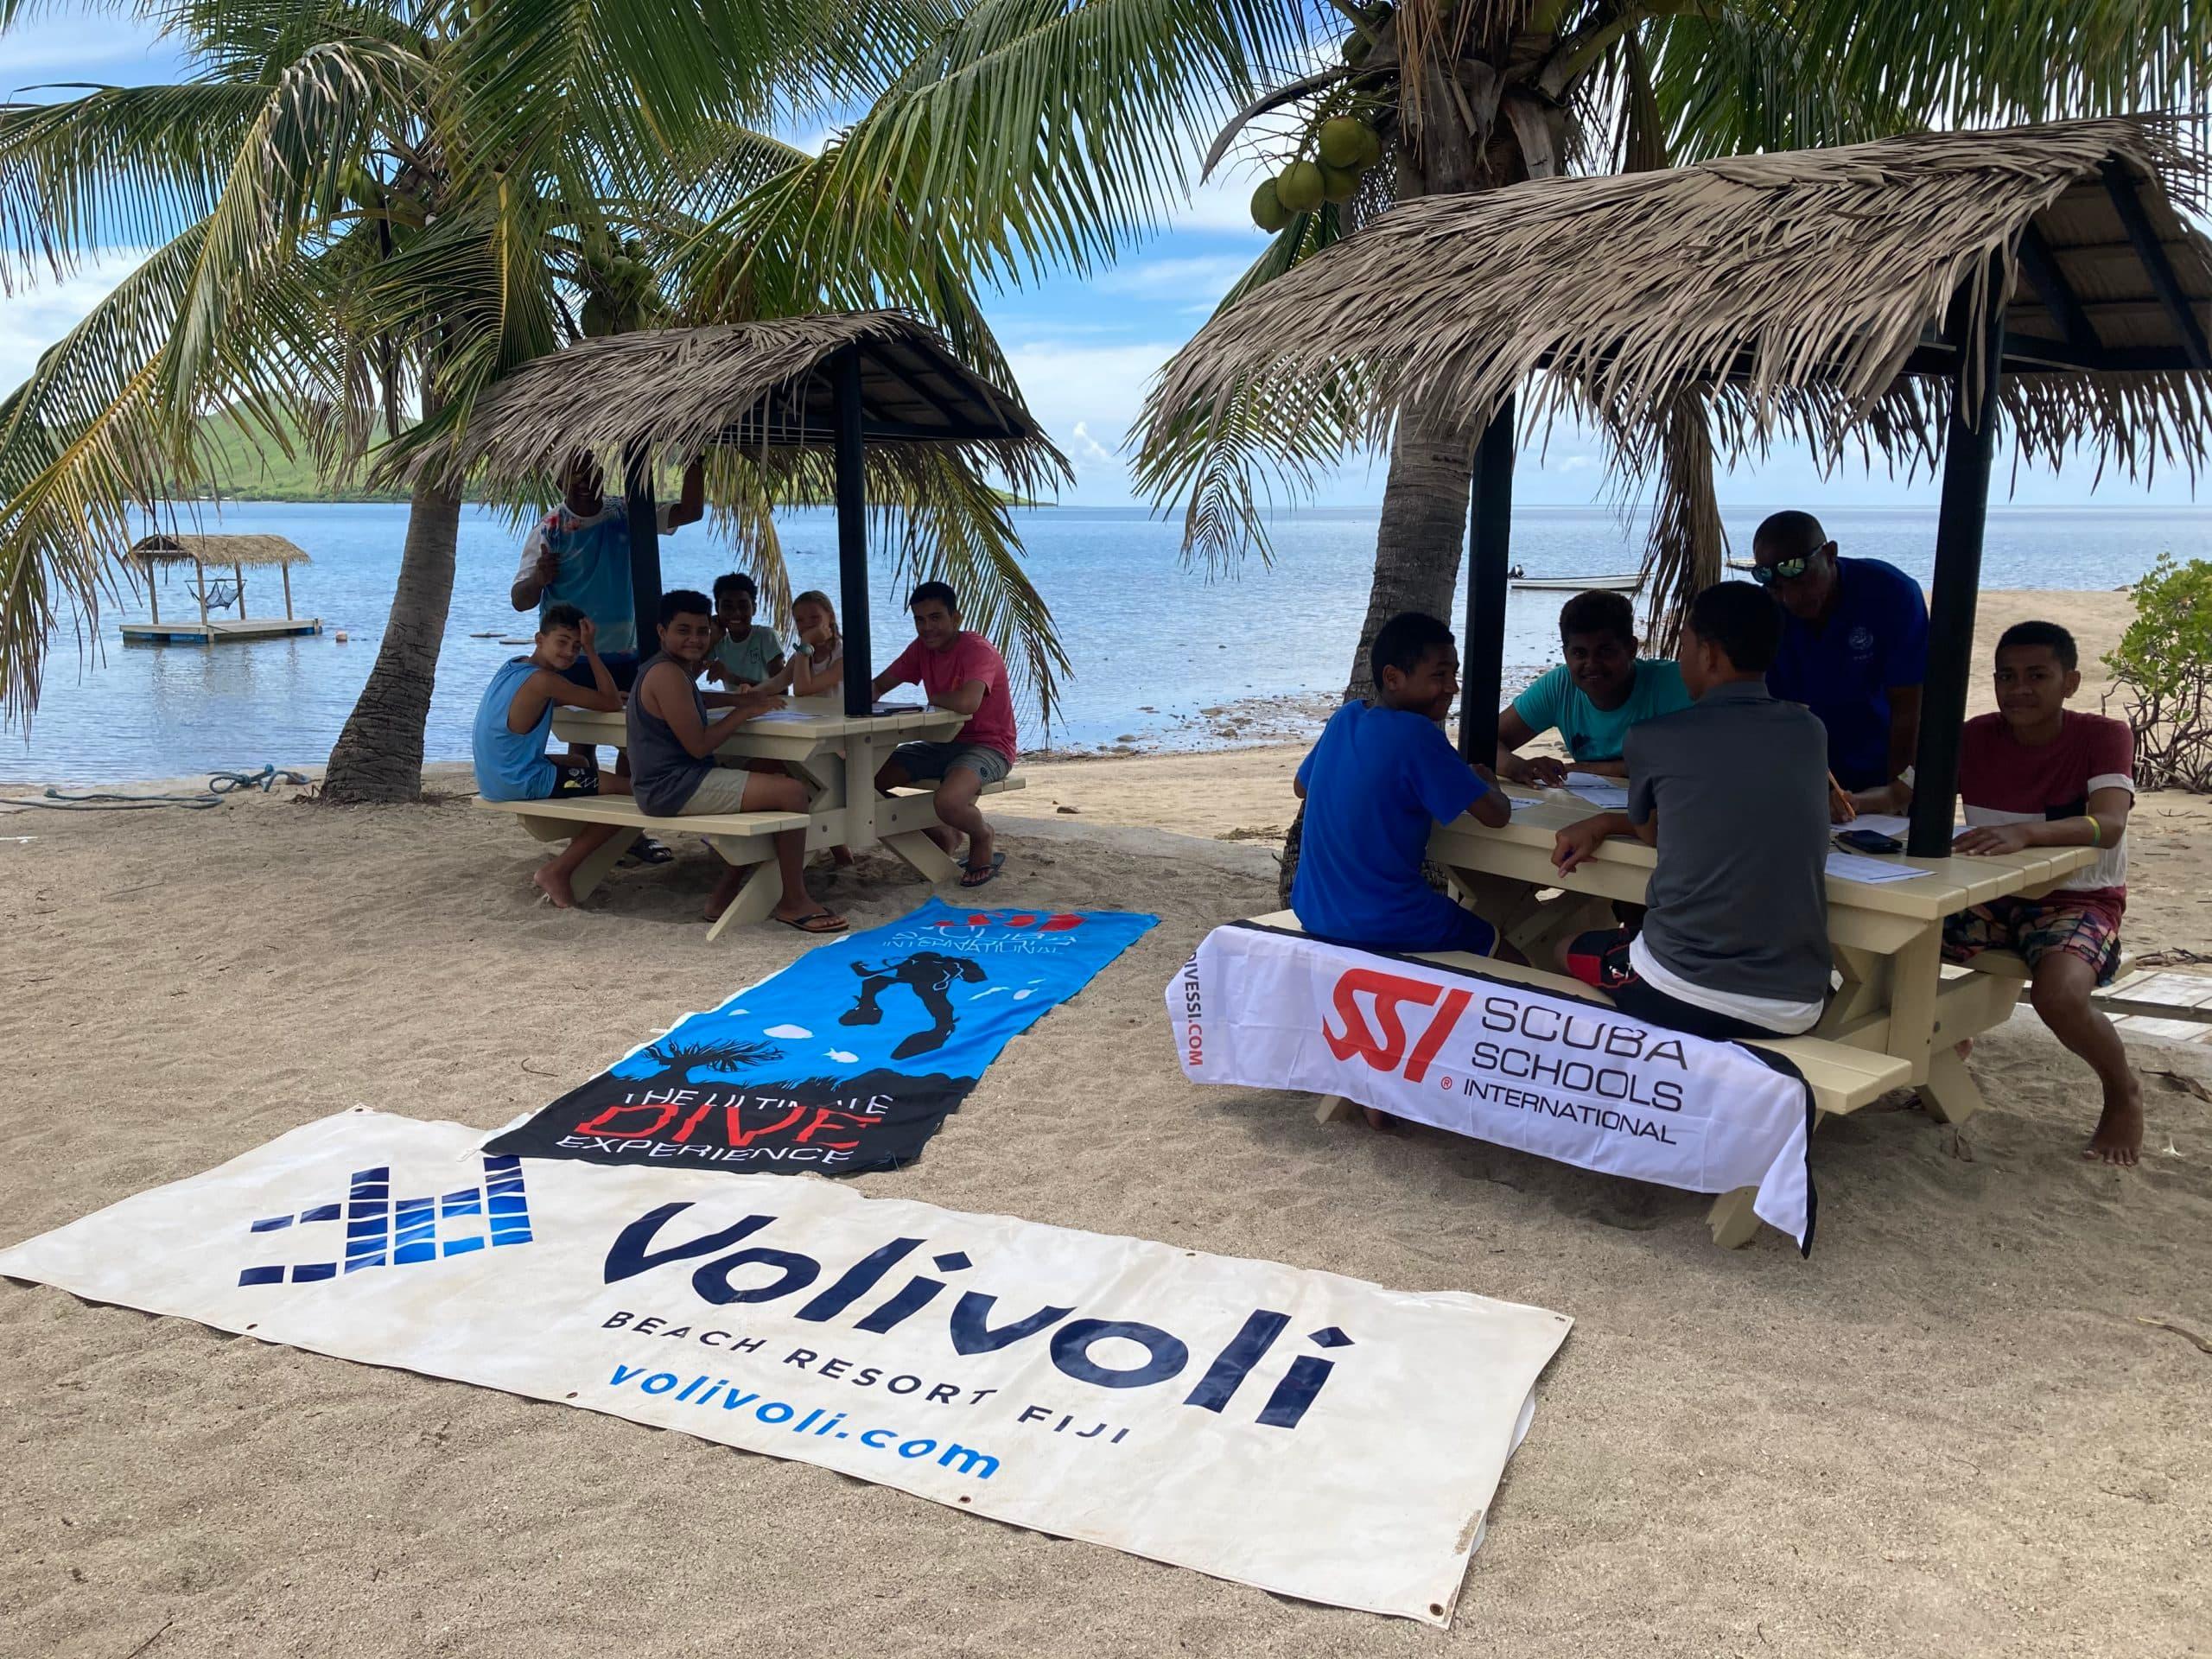 Volivoli Beach Resort Fiji day 3 final exams in an epic classroom